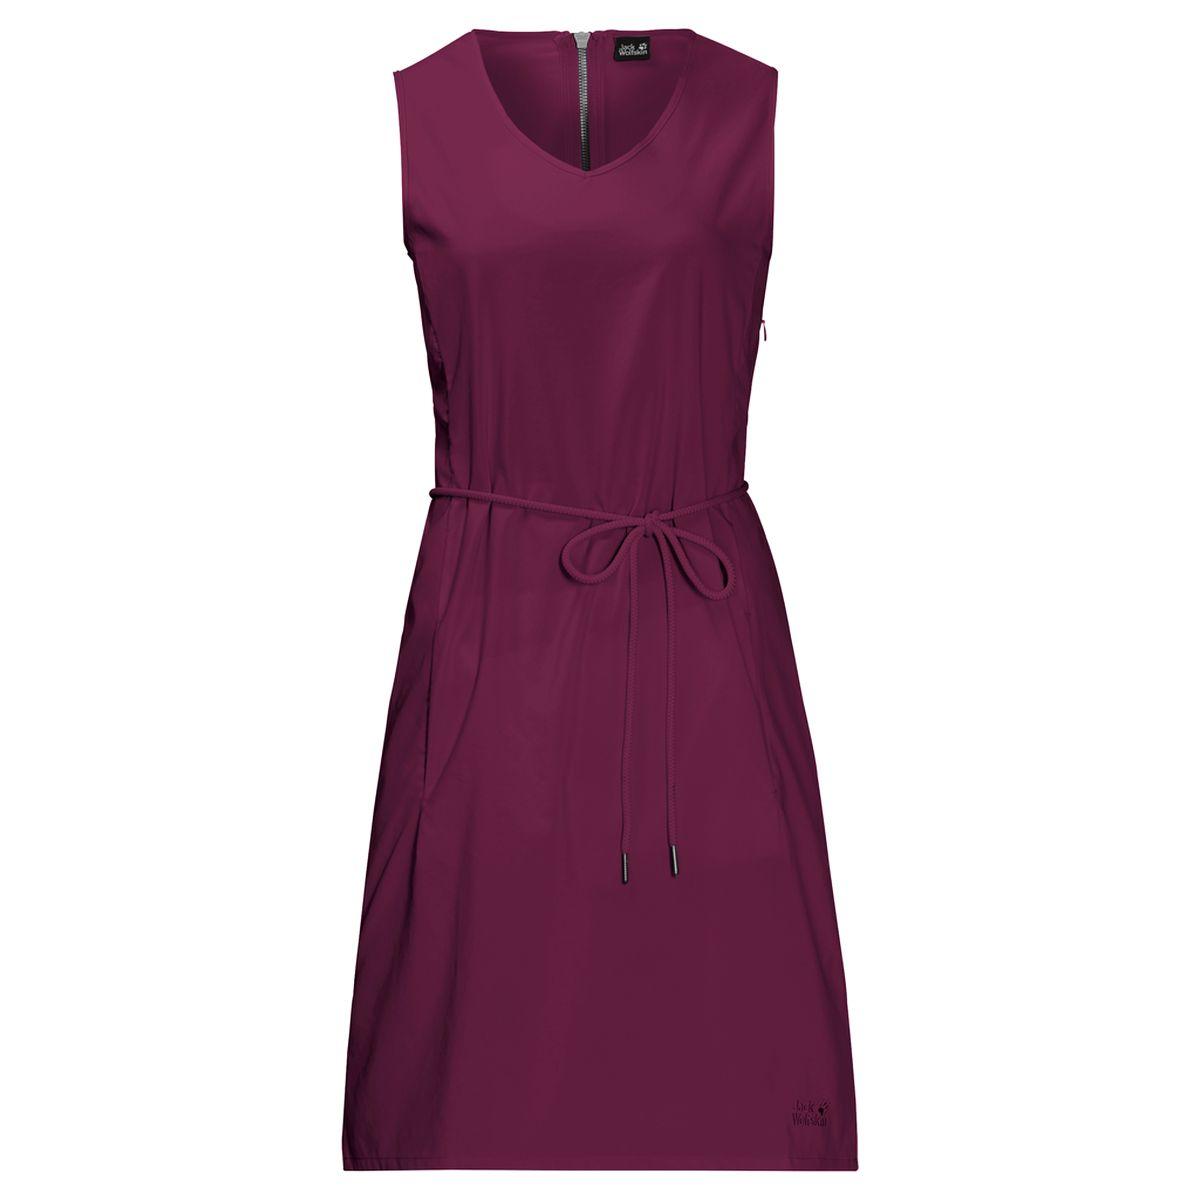 Платье Jack Wolfskin Tioga Road Dress платье jack wolfskin travel dress цвет темно синий 1504051 1910 размер s 44